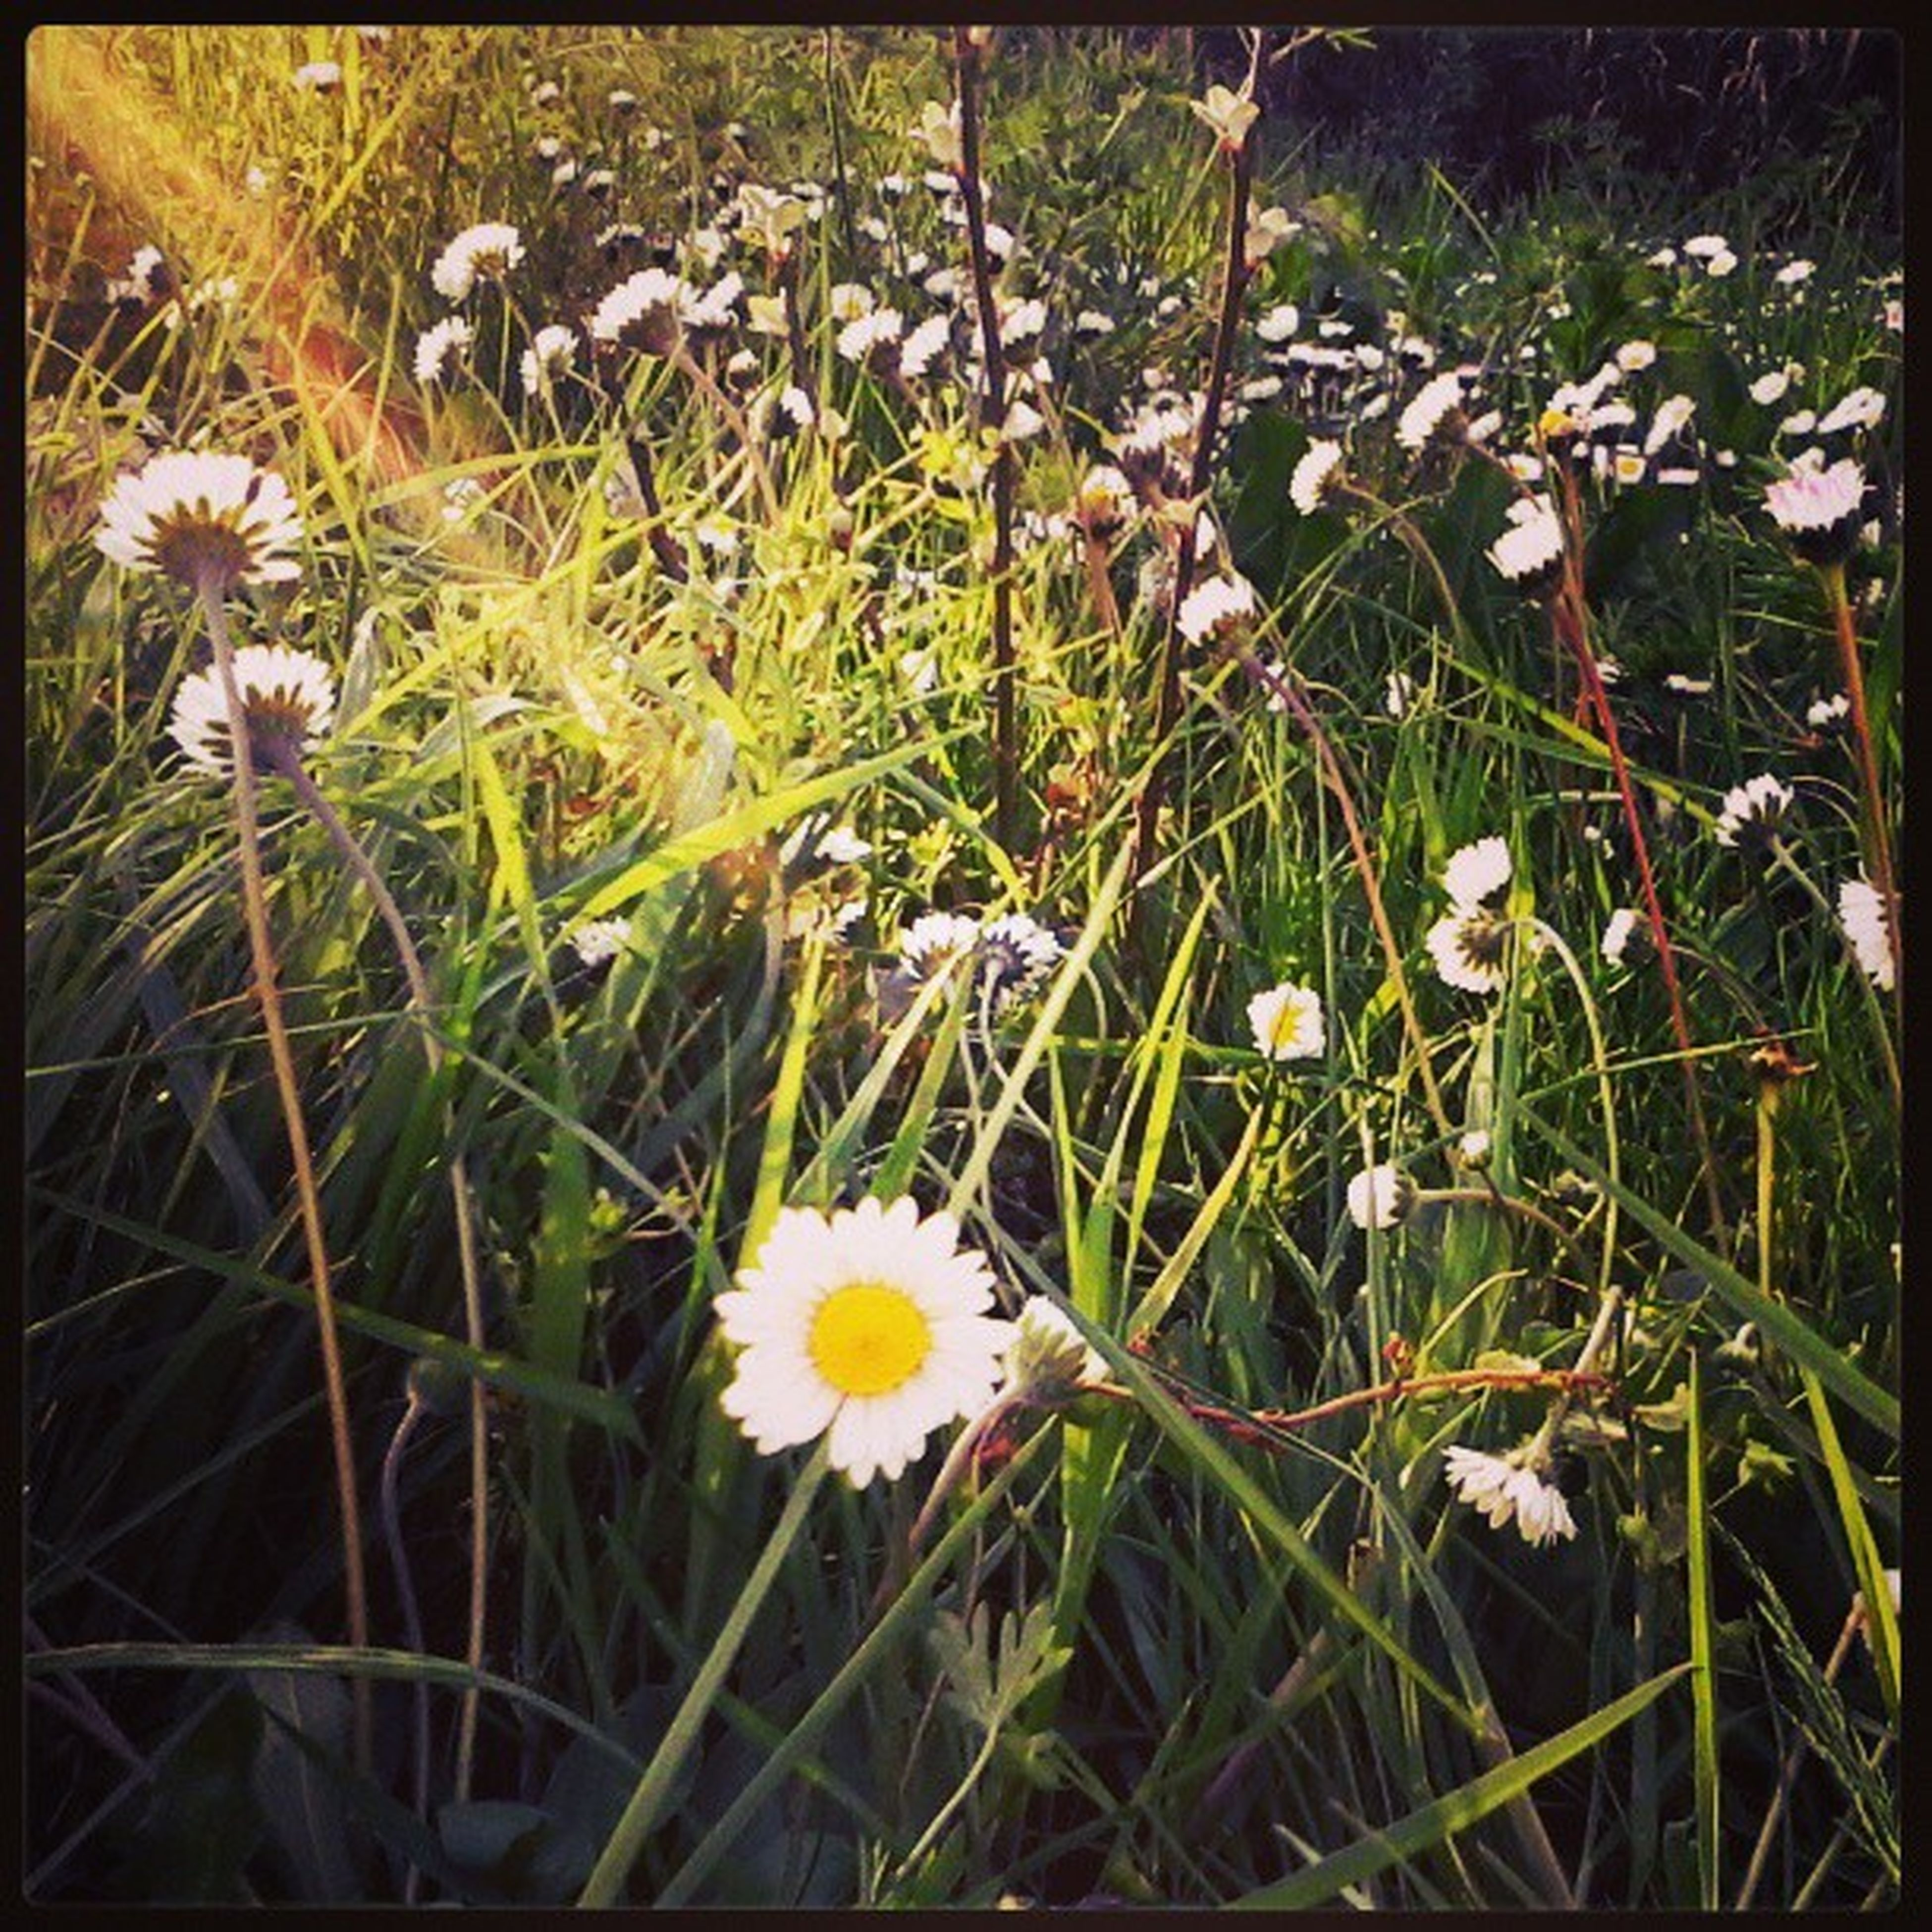 Spring Photograph Photo Photooftheday primavera picoftheday margherita margherite prato mare erba flowers flower followme follow sole sun marano coriano rimini italy italia